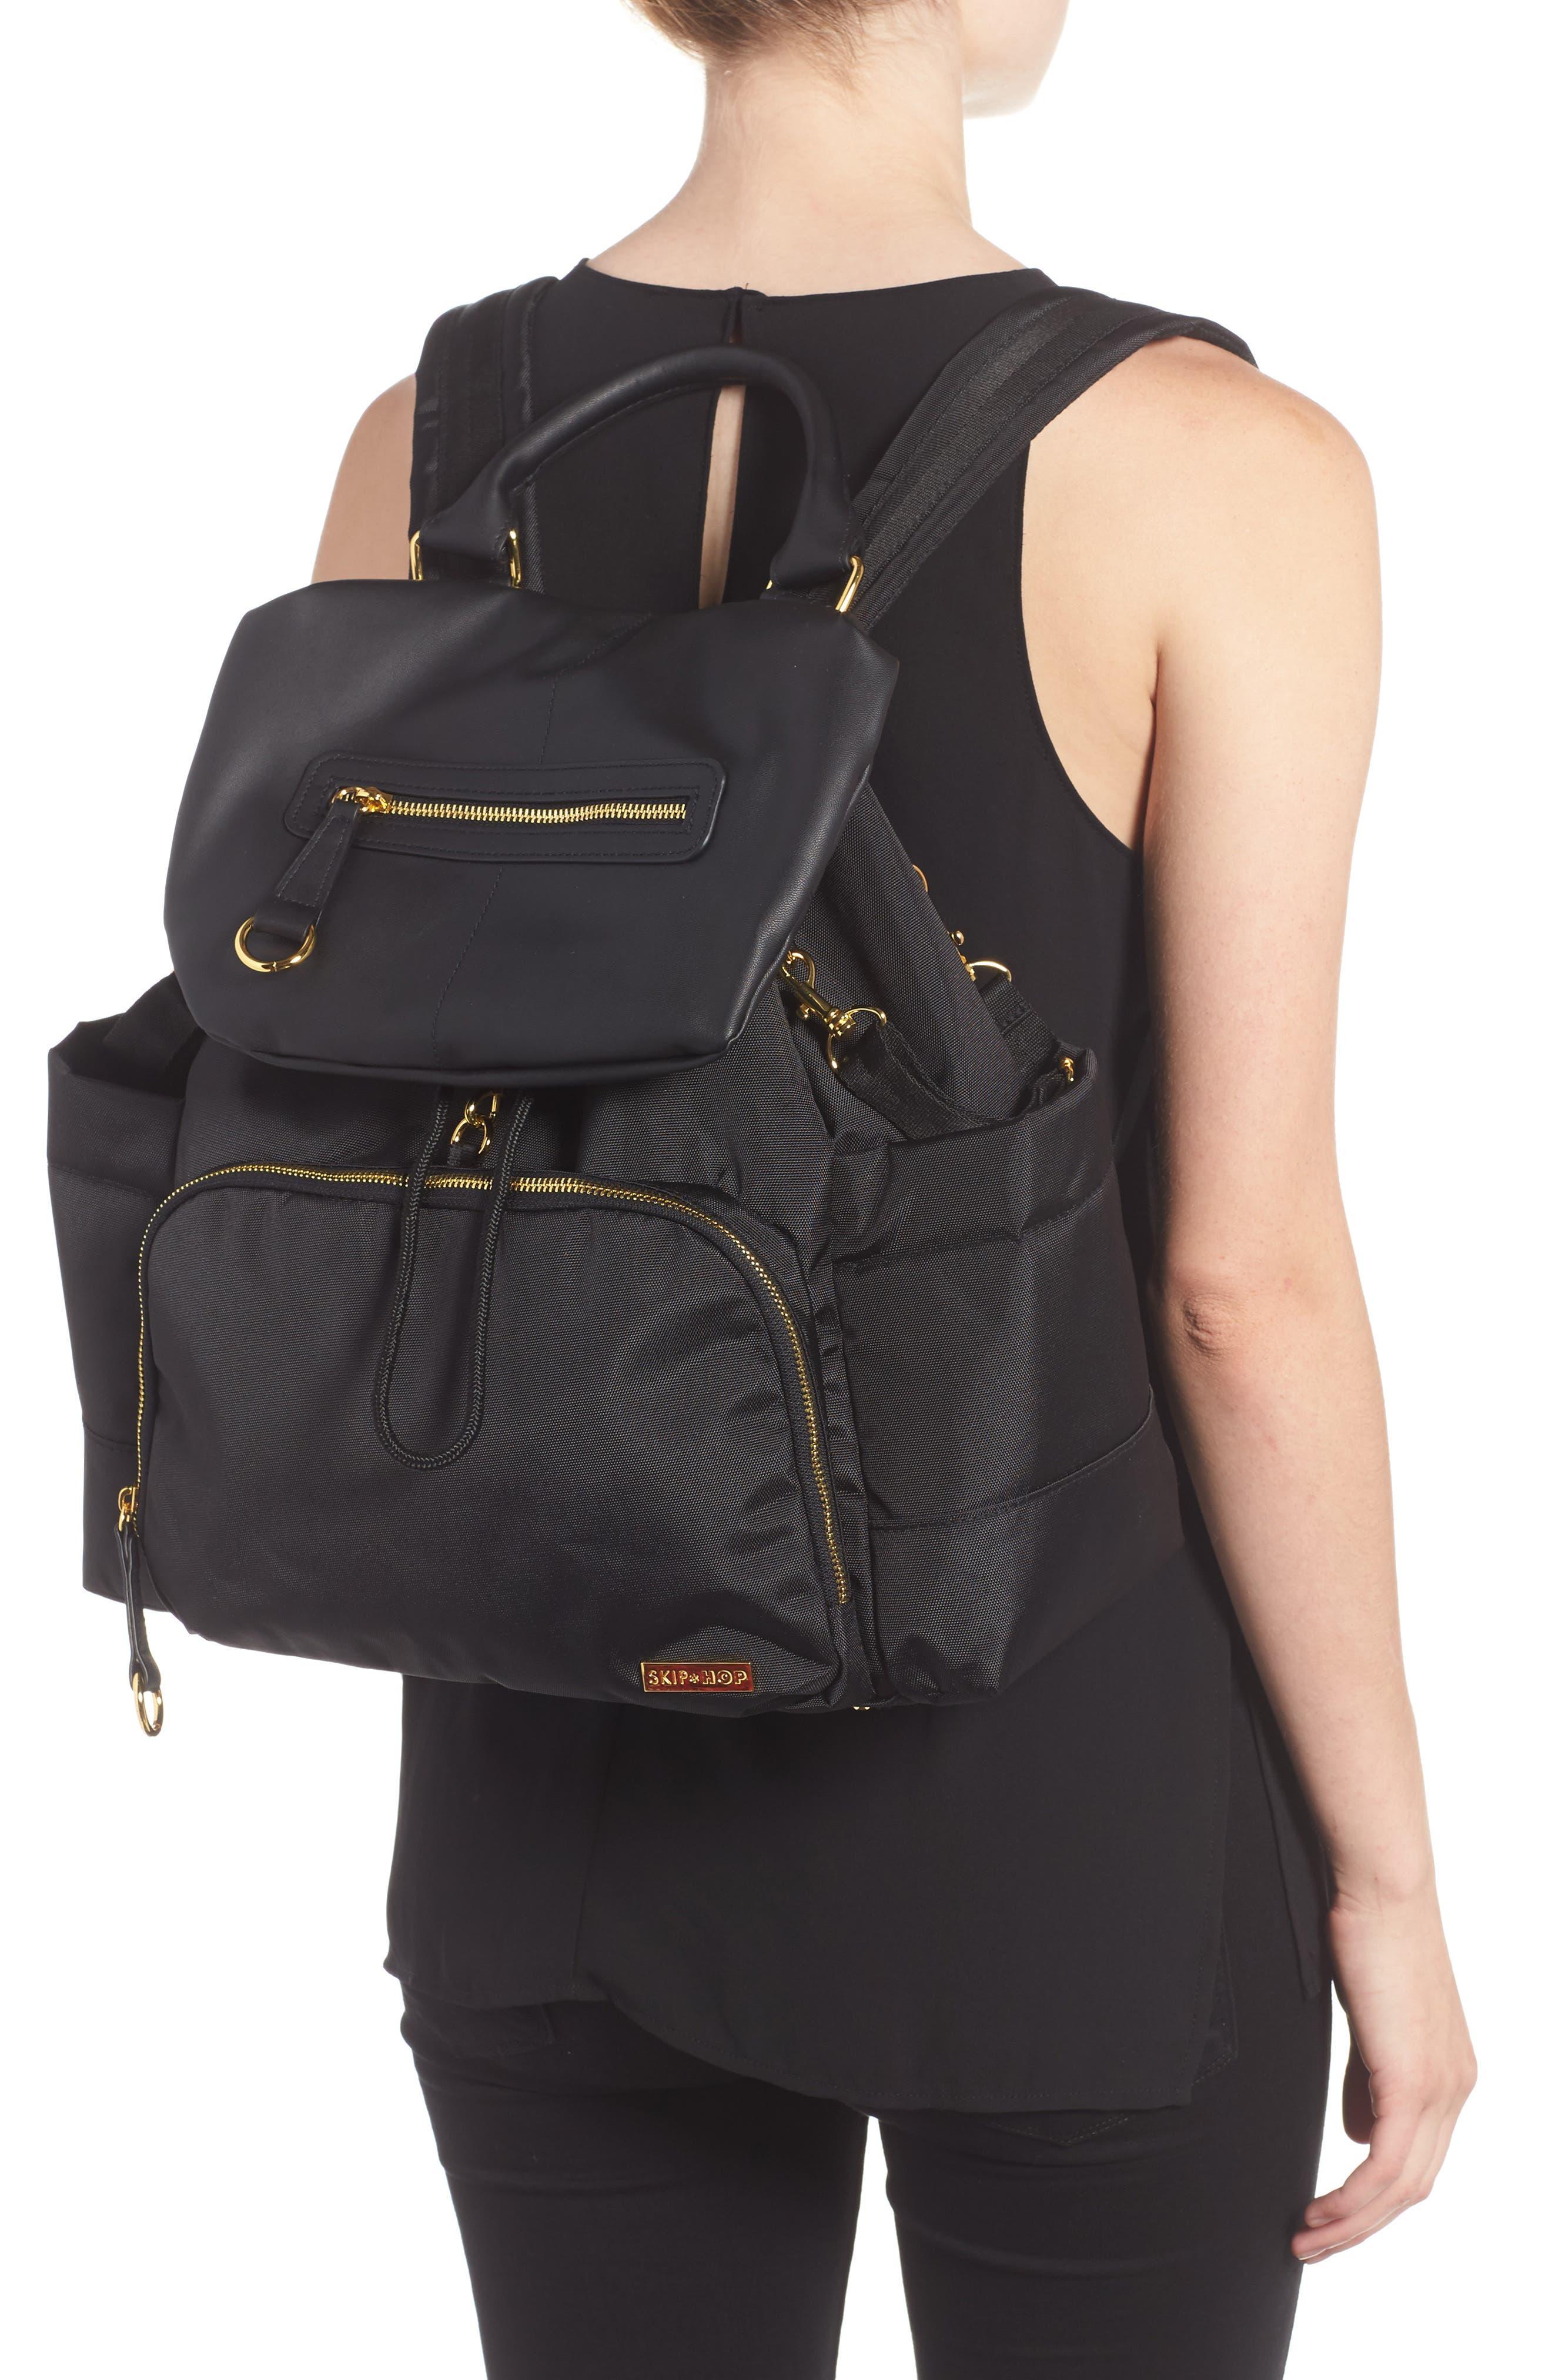 'Chelsea' Diaper Bag Backpack,                             Alternate thumbnail 2, color,                             BLACK